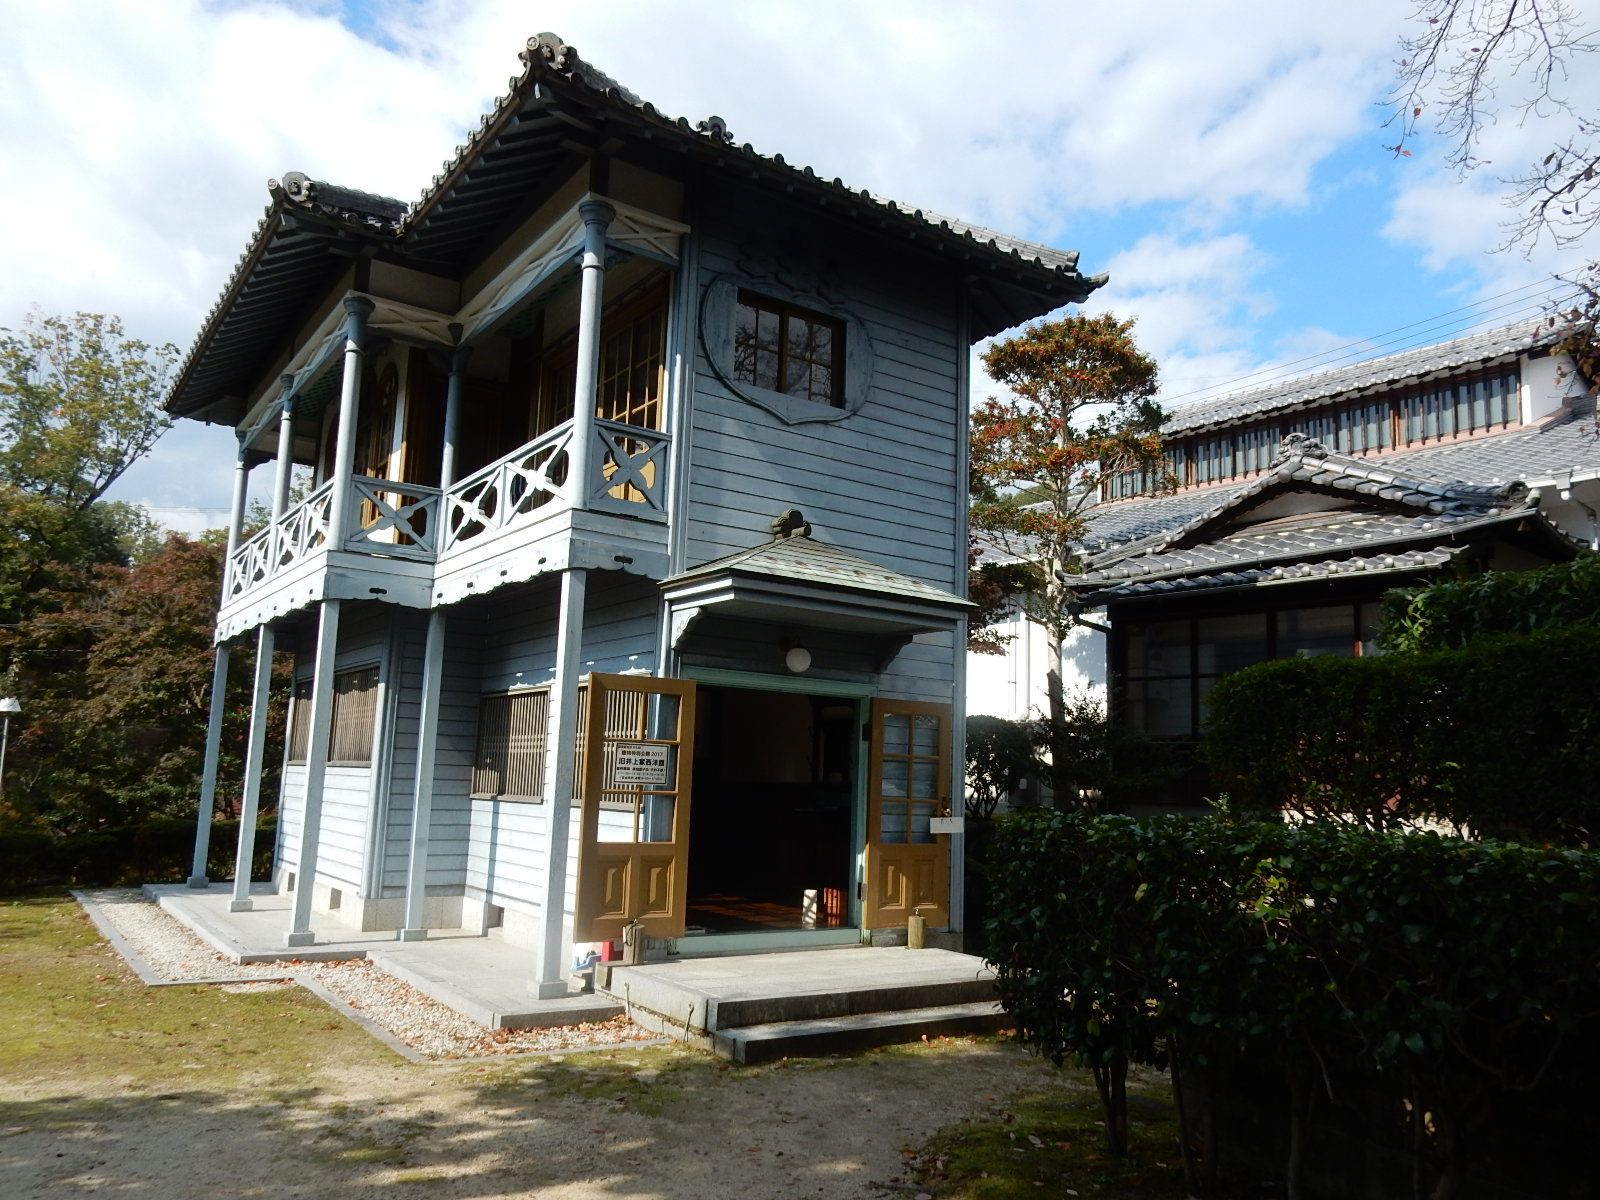 愛知県内の古建築や近代建築物等の国登録有形文化財の特別公開 豊田市